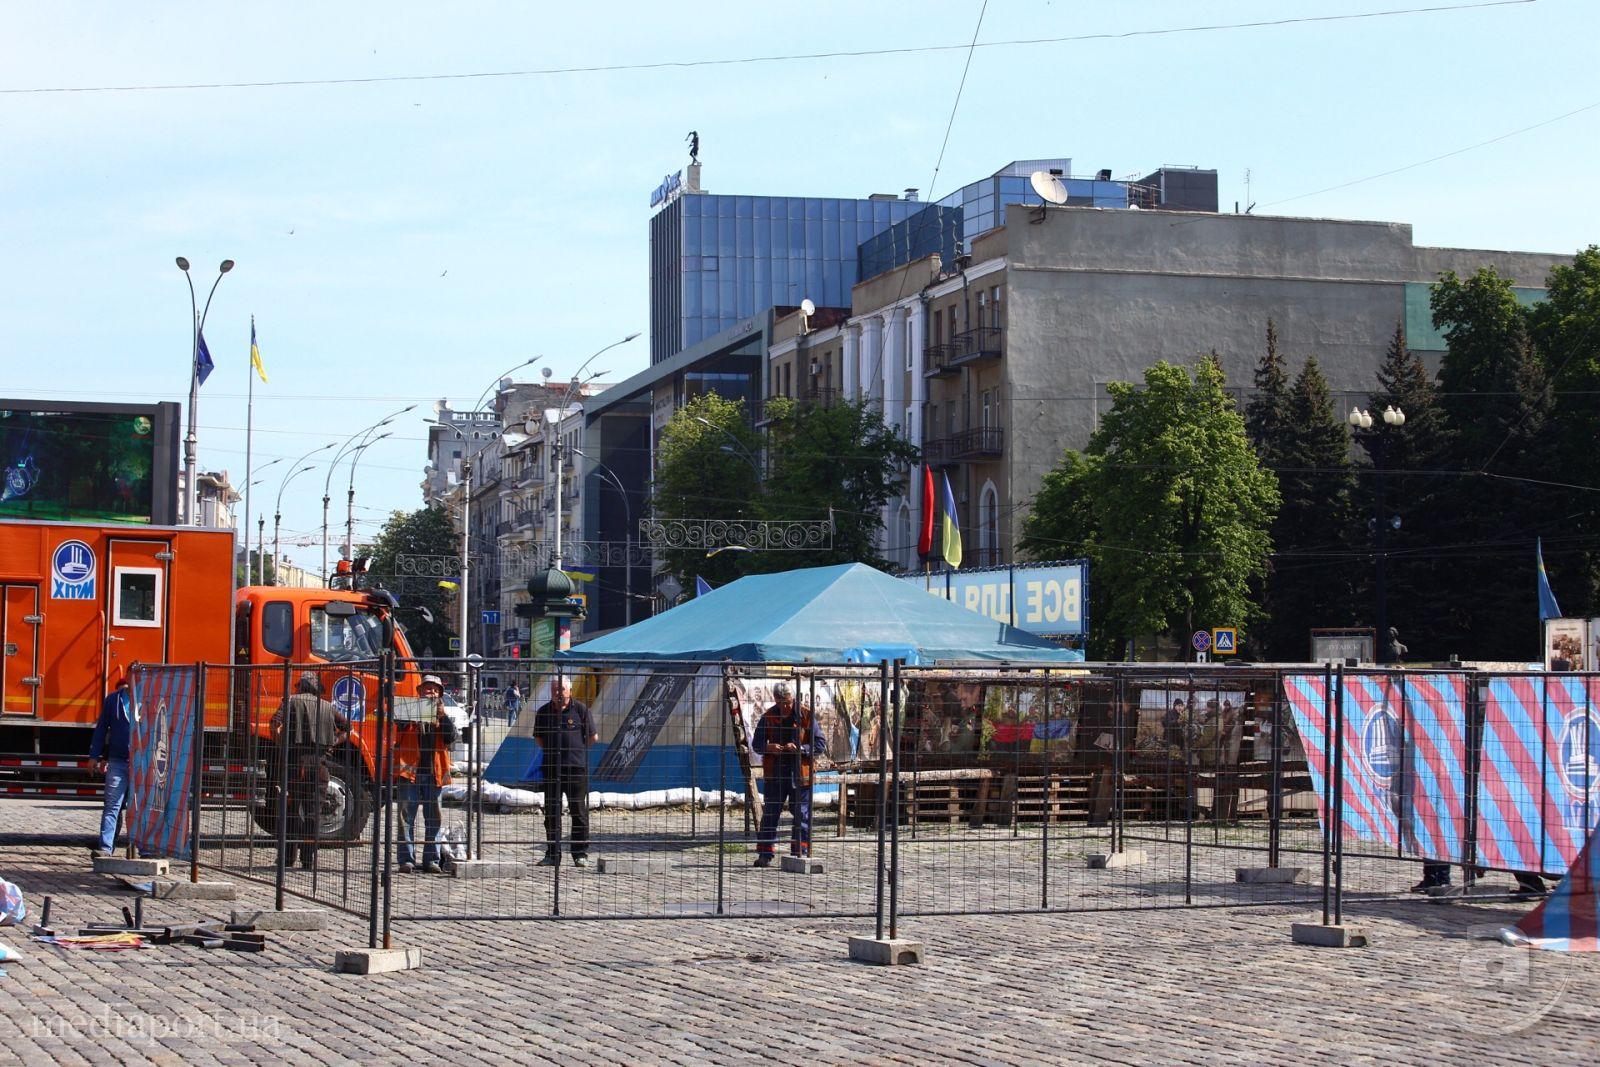 Представители общественных организаций разбирают забор / фото mediaport.ua